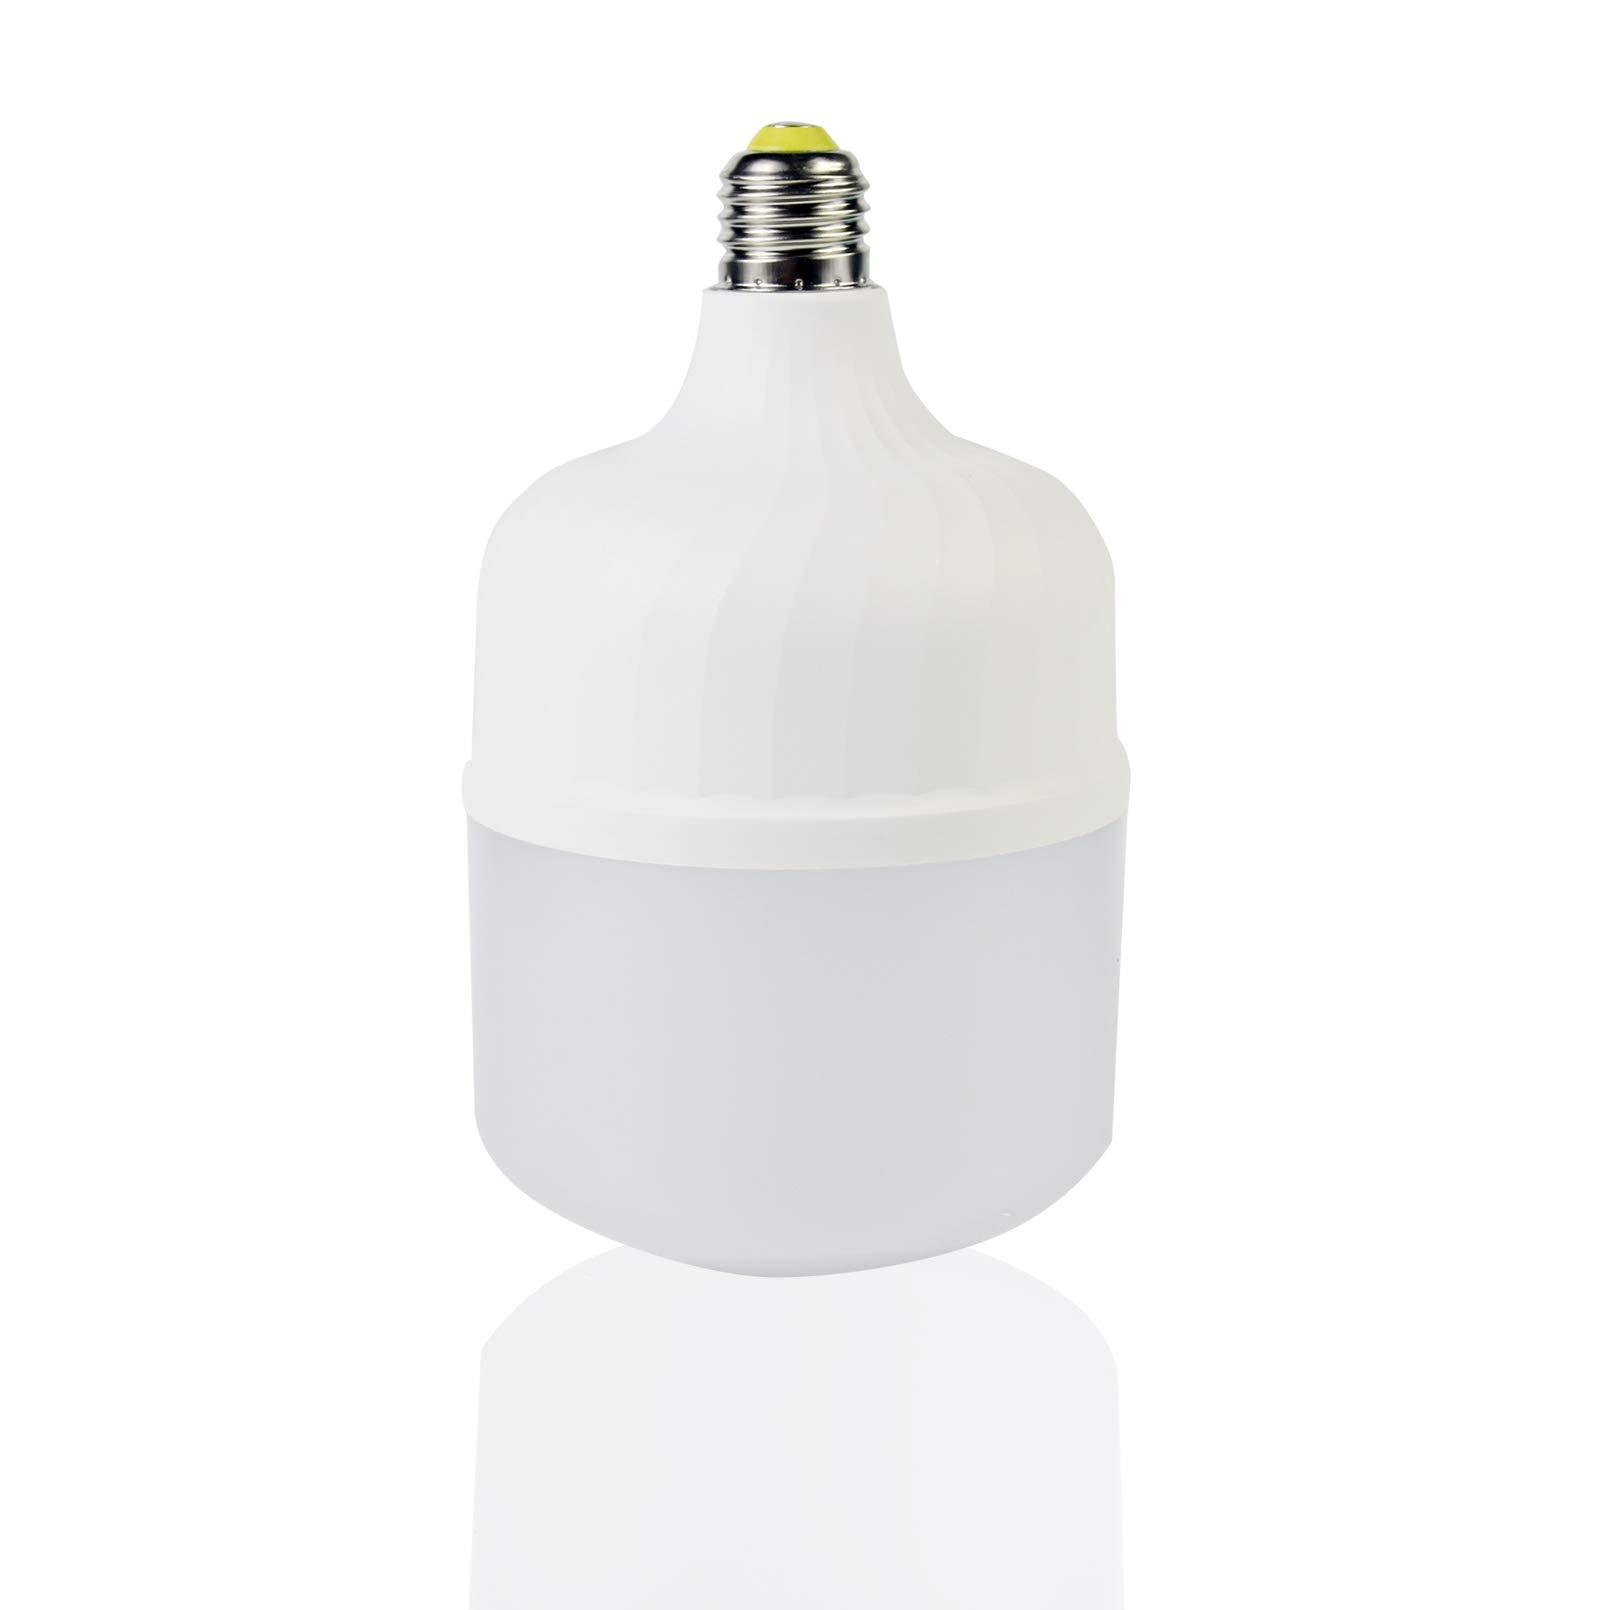 20W High Watt LED Bulbs 140W-160W Equivalent, LED Light Soft White 6500K High Intensity Shop Light with Free E27 Converter, 2200 Lumens LED Commercial for Yard Garage Warehouse Workshop